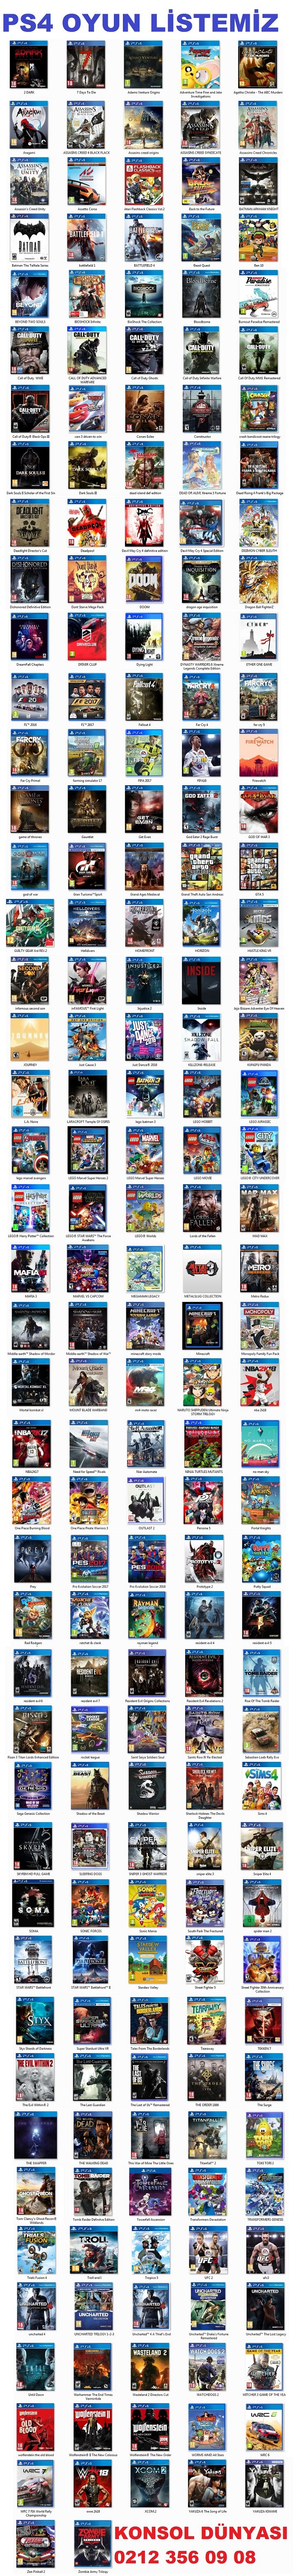 PS4 FULL OYUN LİSTESİ JPEG - Kopya